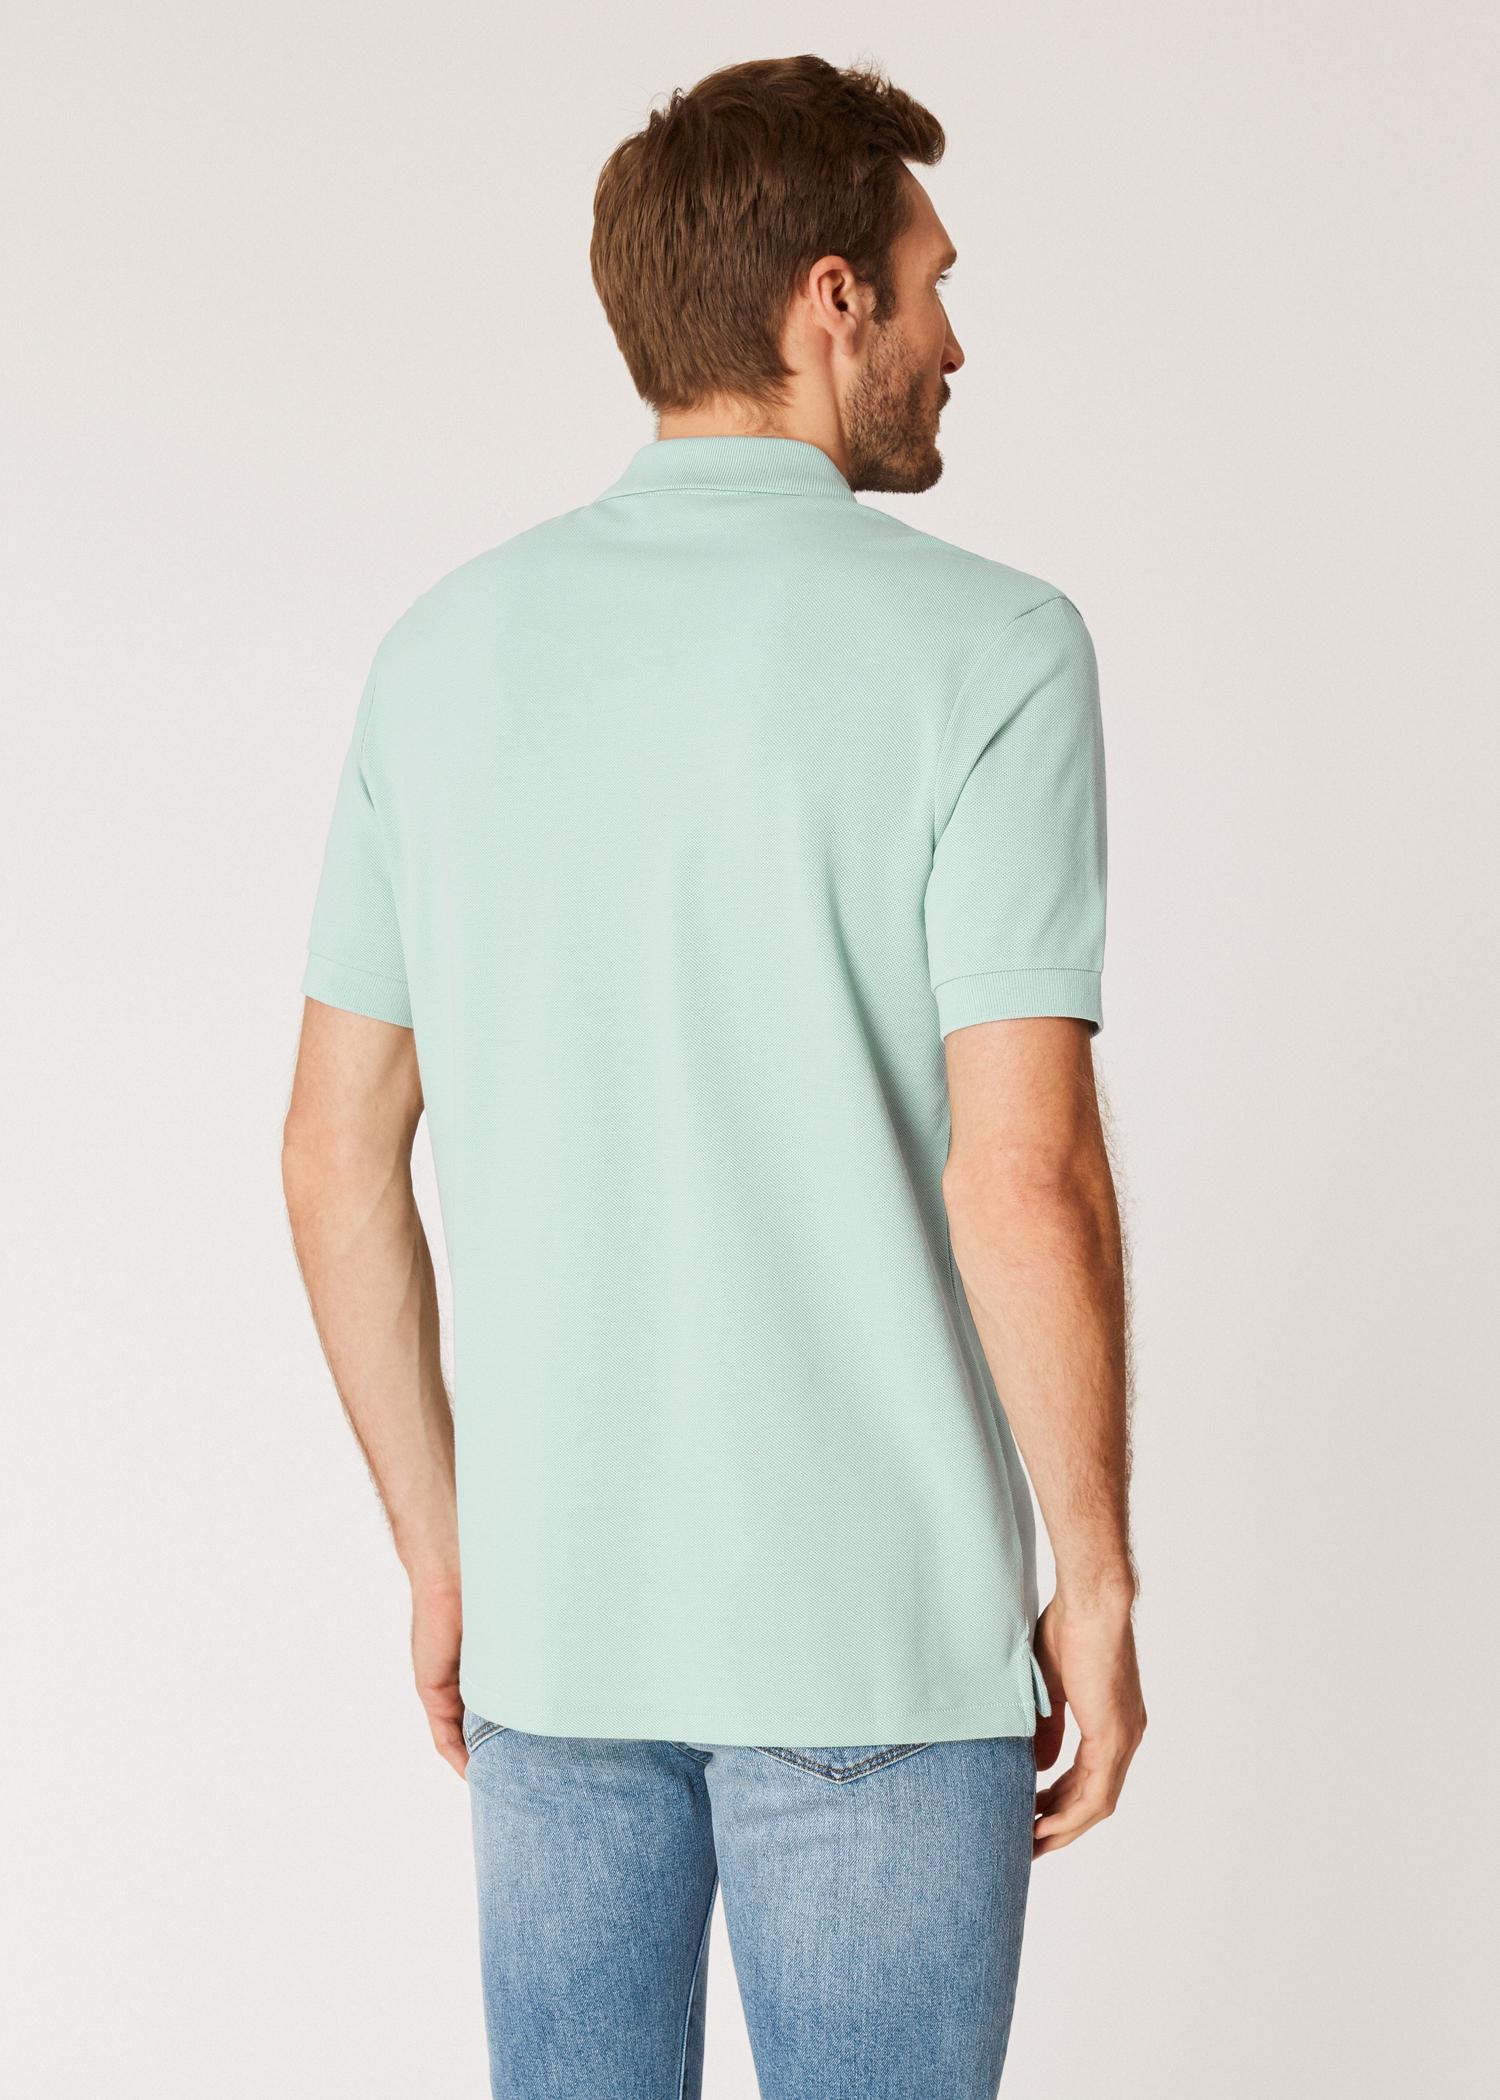 b7dd10ee Model back close up - Men's Mint Organic Cotton-Piqué Zebra Logo Polo Shirt  Paul